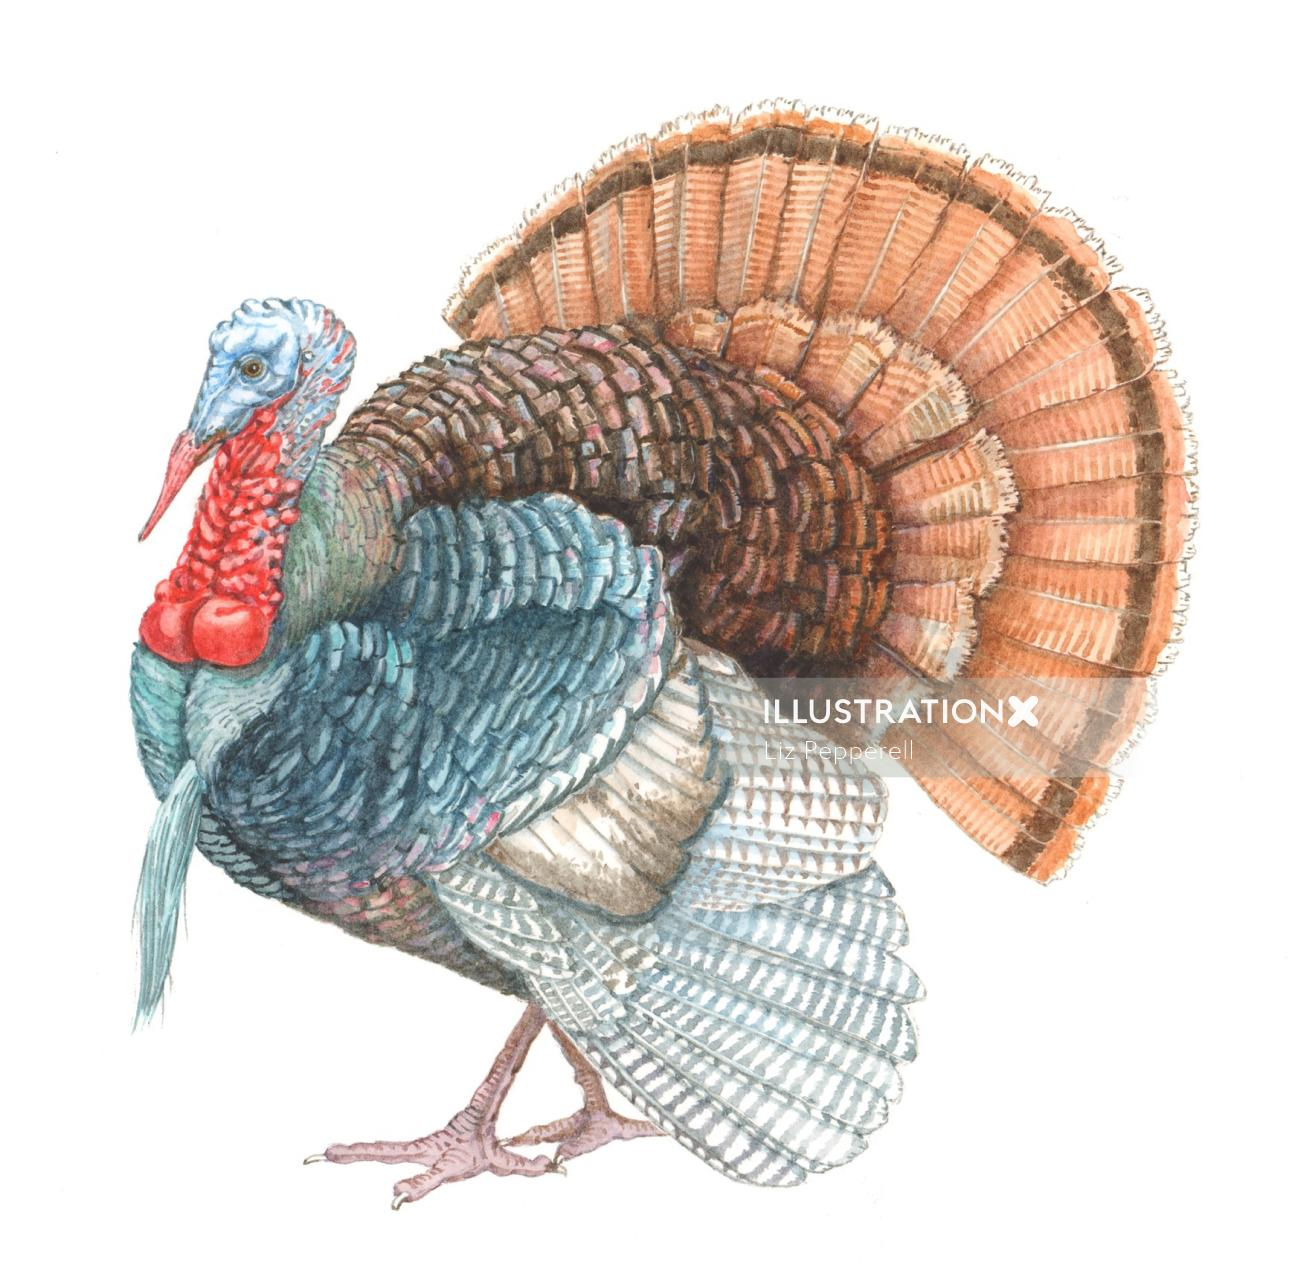 Turkey Gravy animal illustration